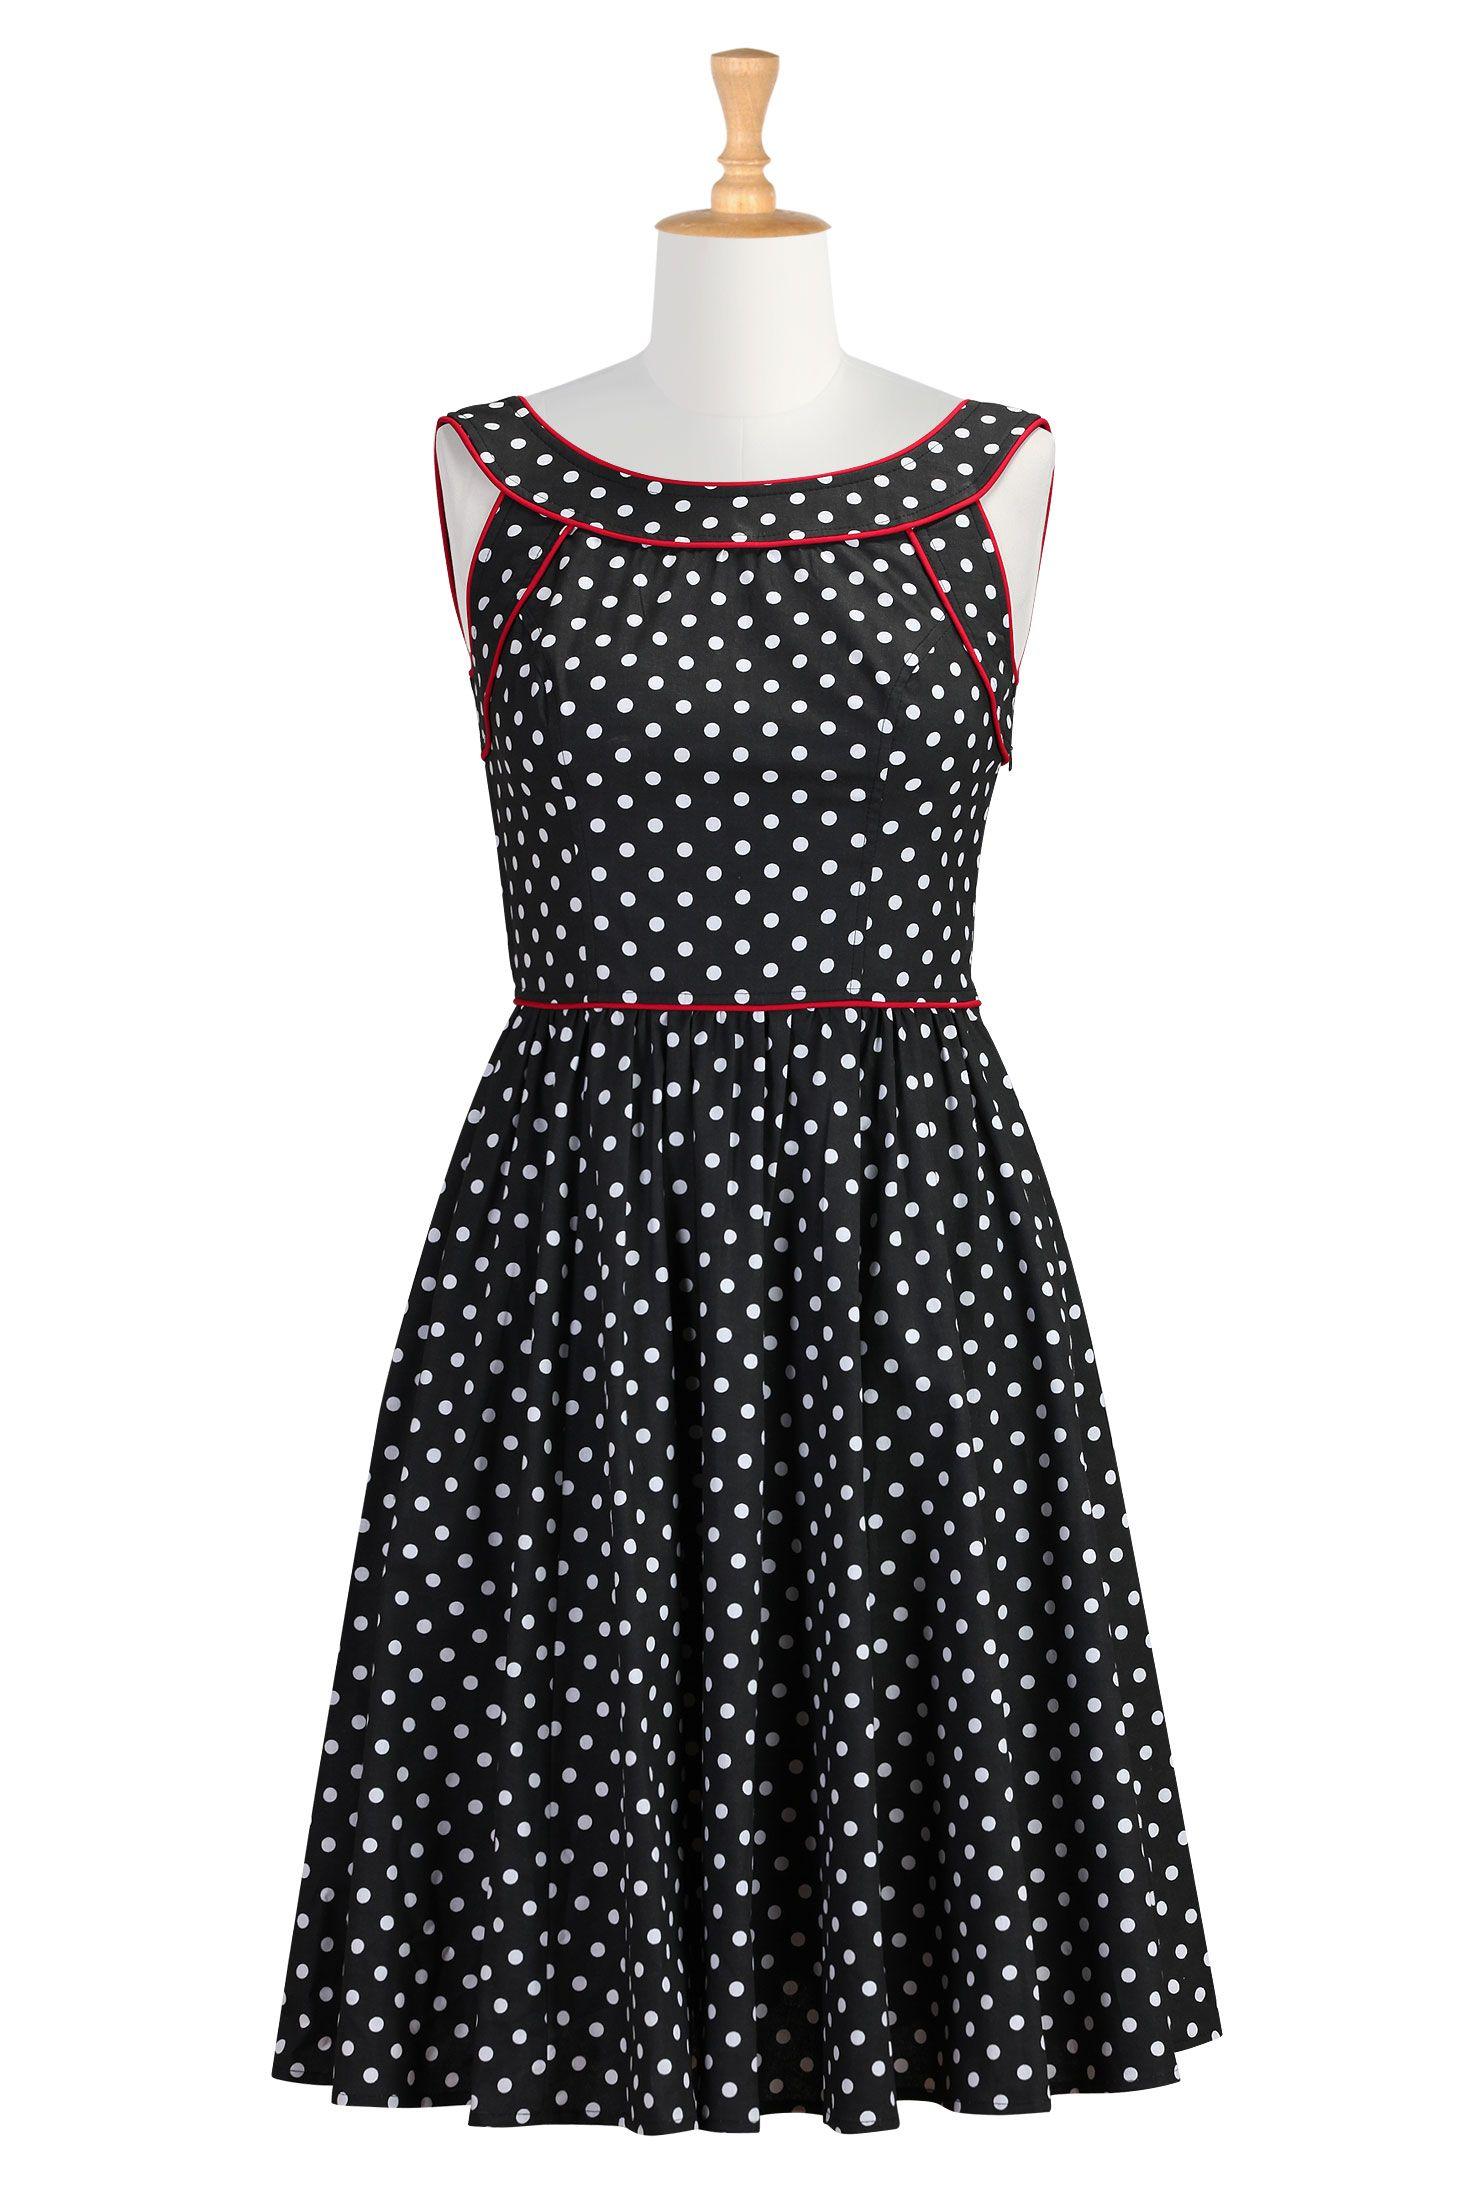 9e2ed8a52bc Vintage Polka Dot Dresses - 50s Spotty and Ditsy Prints